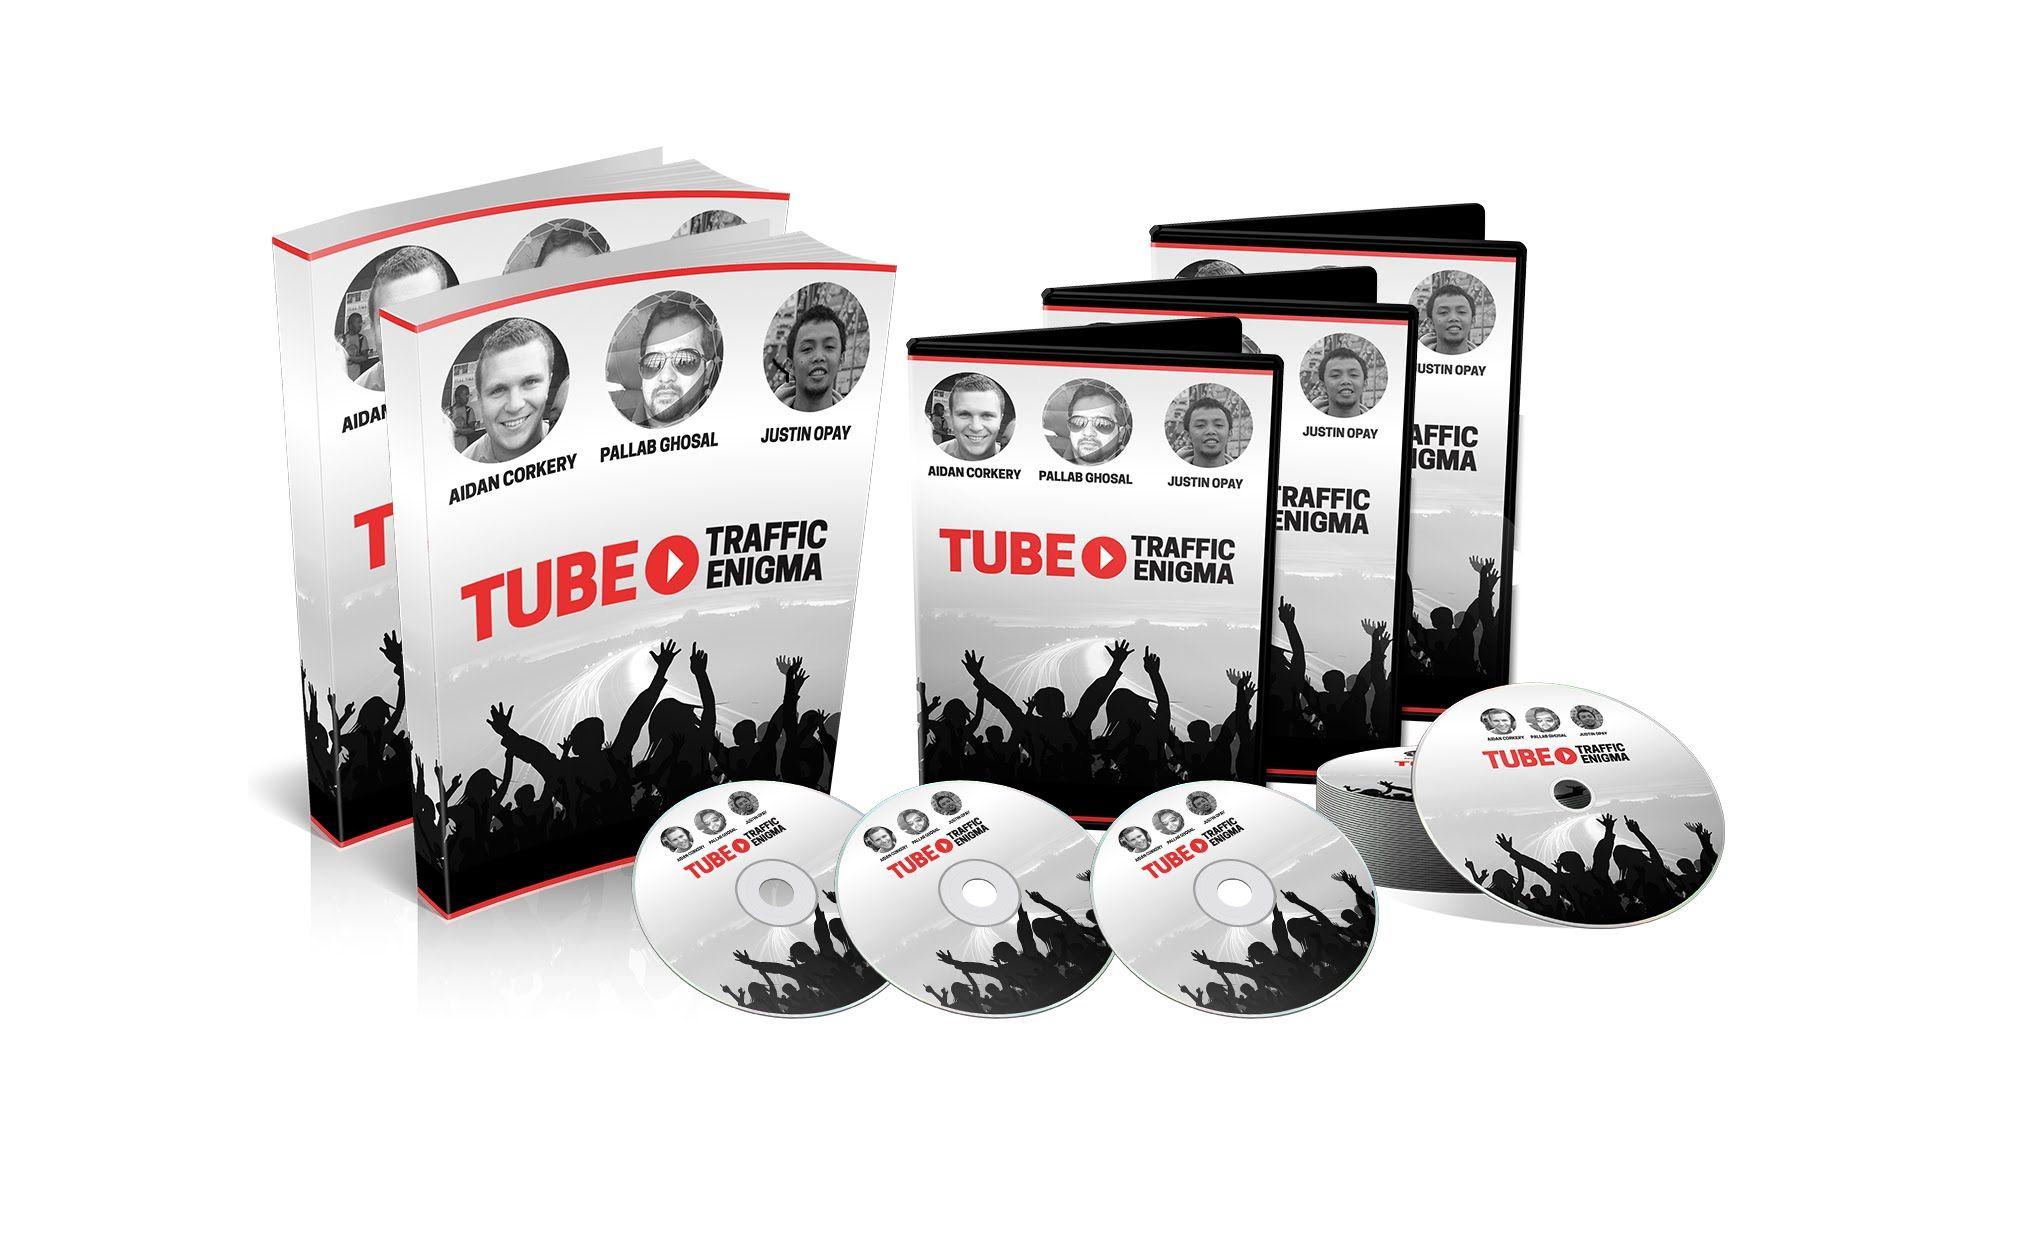 Tube Traffic Enigma ReviEW https://www.youtube.com/watch?v=OtvFDMRb-0g